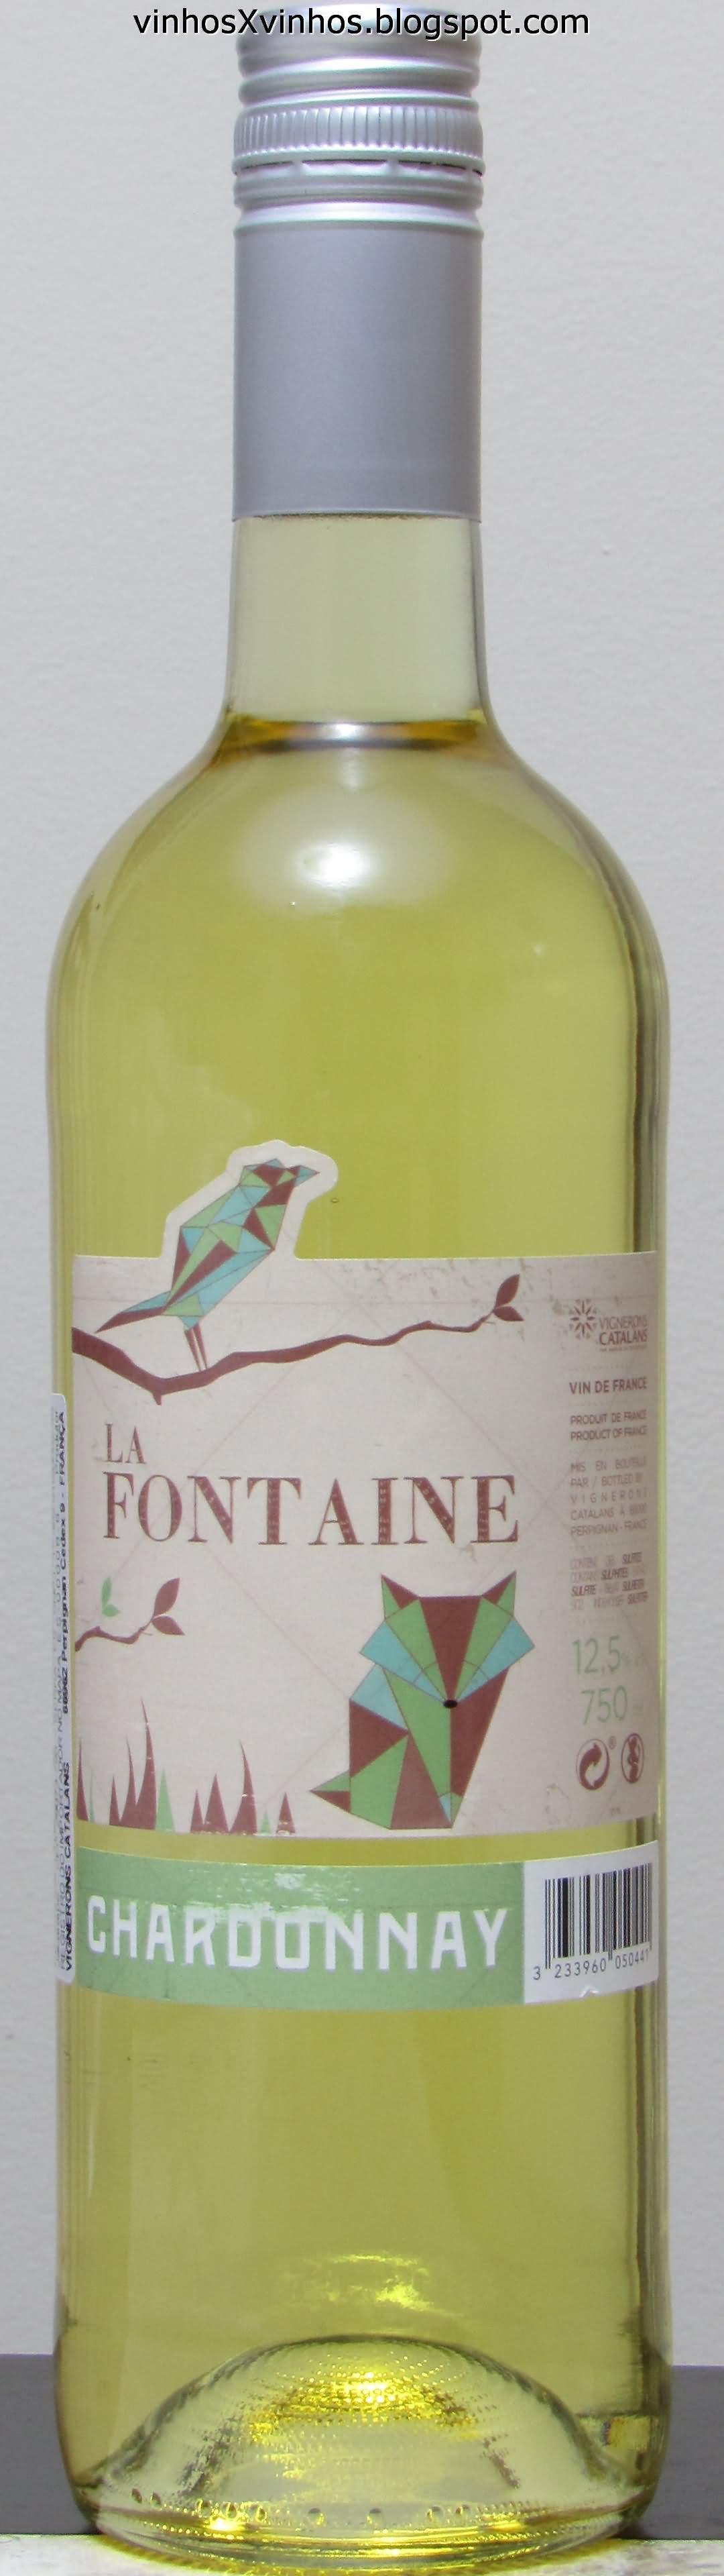 La Fontaine Chardonnay